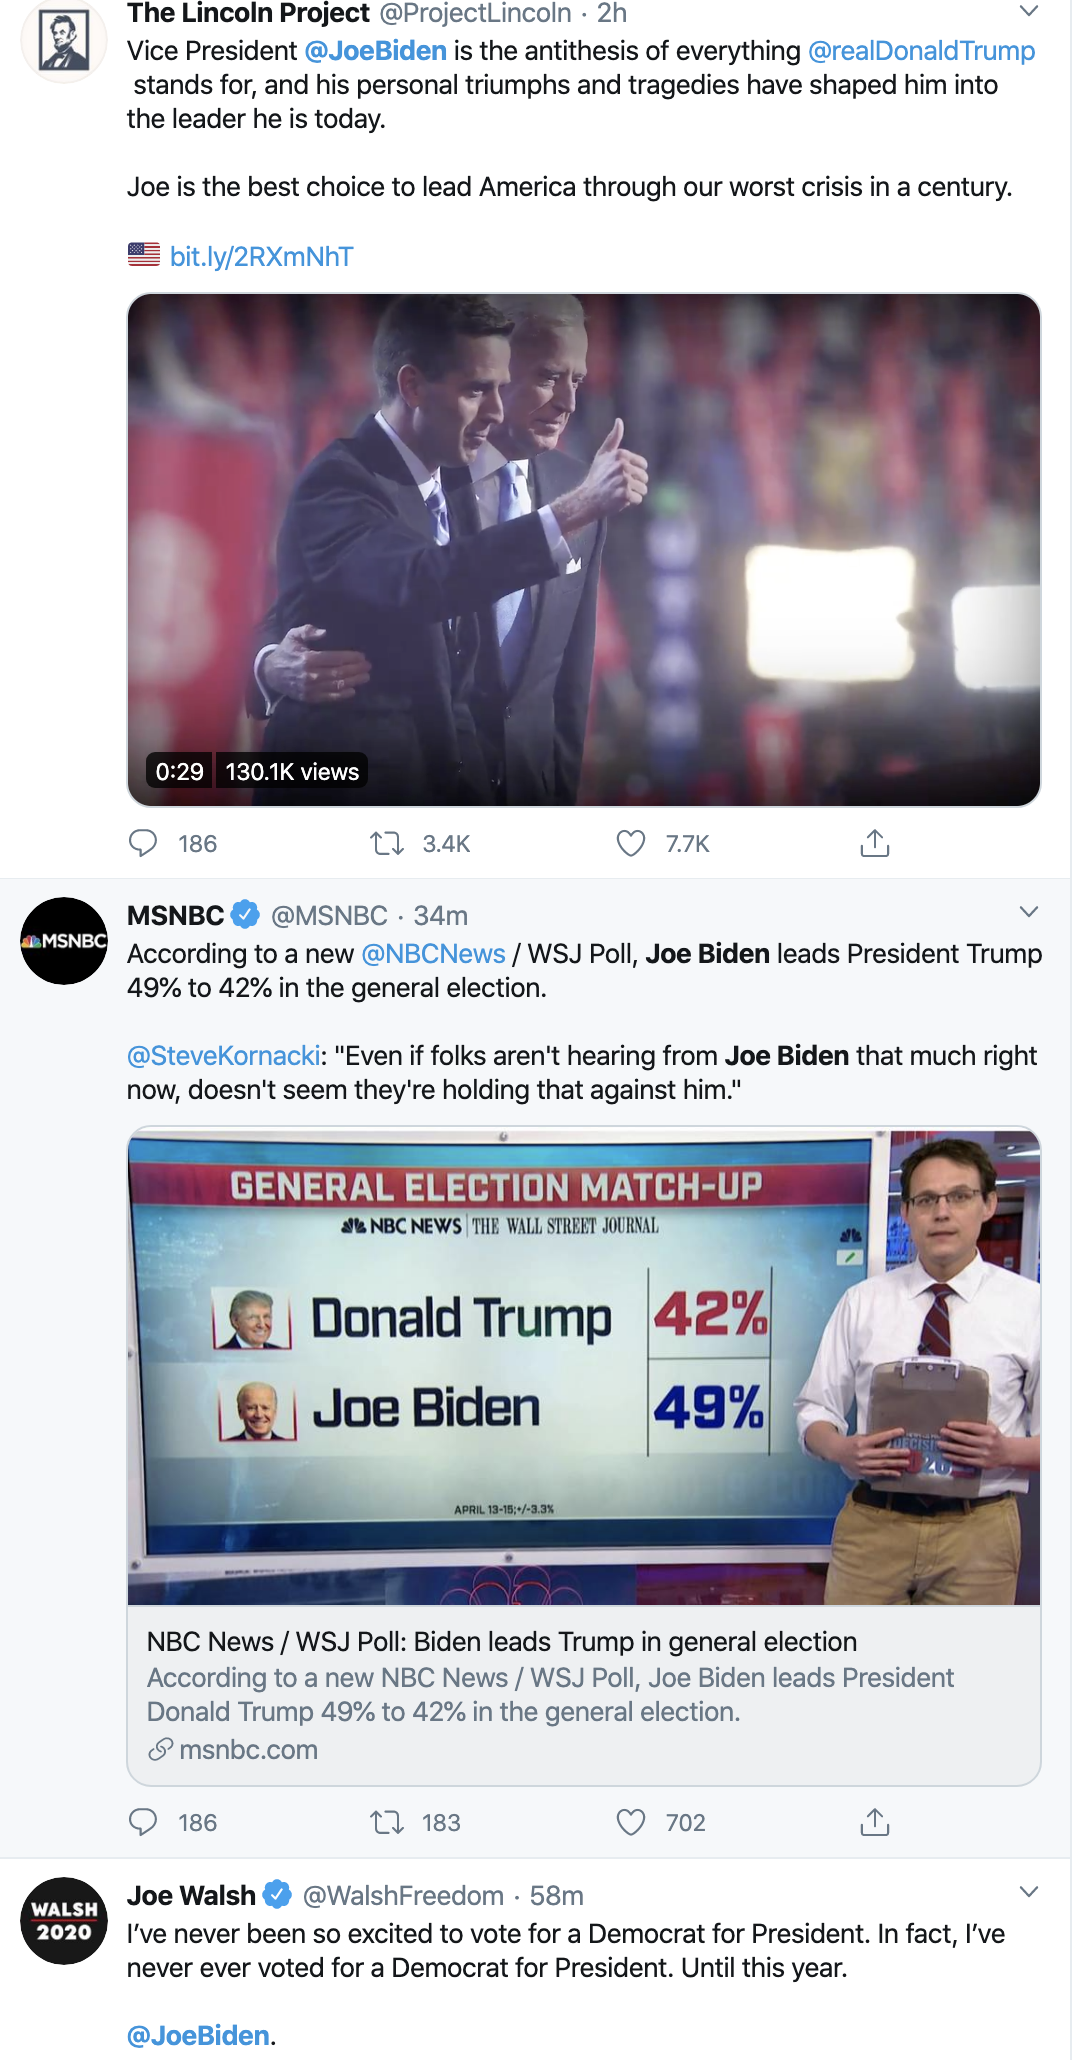 Screen-Shot-2020-04-21-at-8.39.38-AM Joe Biden Makes Tuesday Obama VP Announcement Donald Trump Election 2020 Featured Politics Top Stories